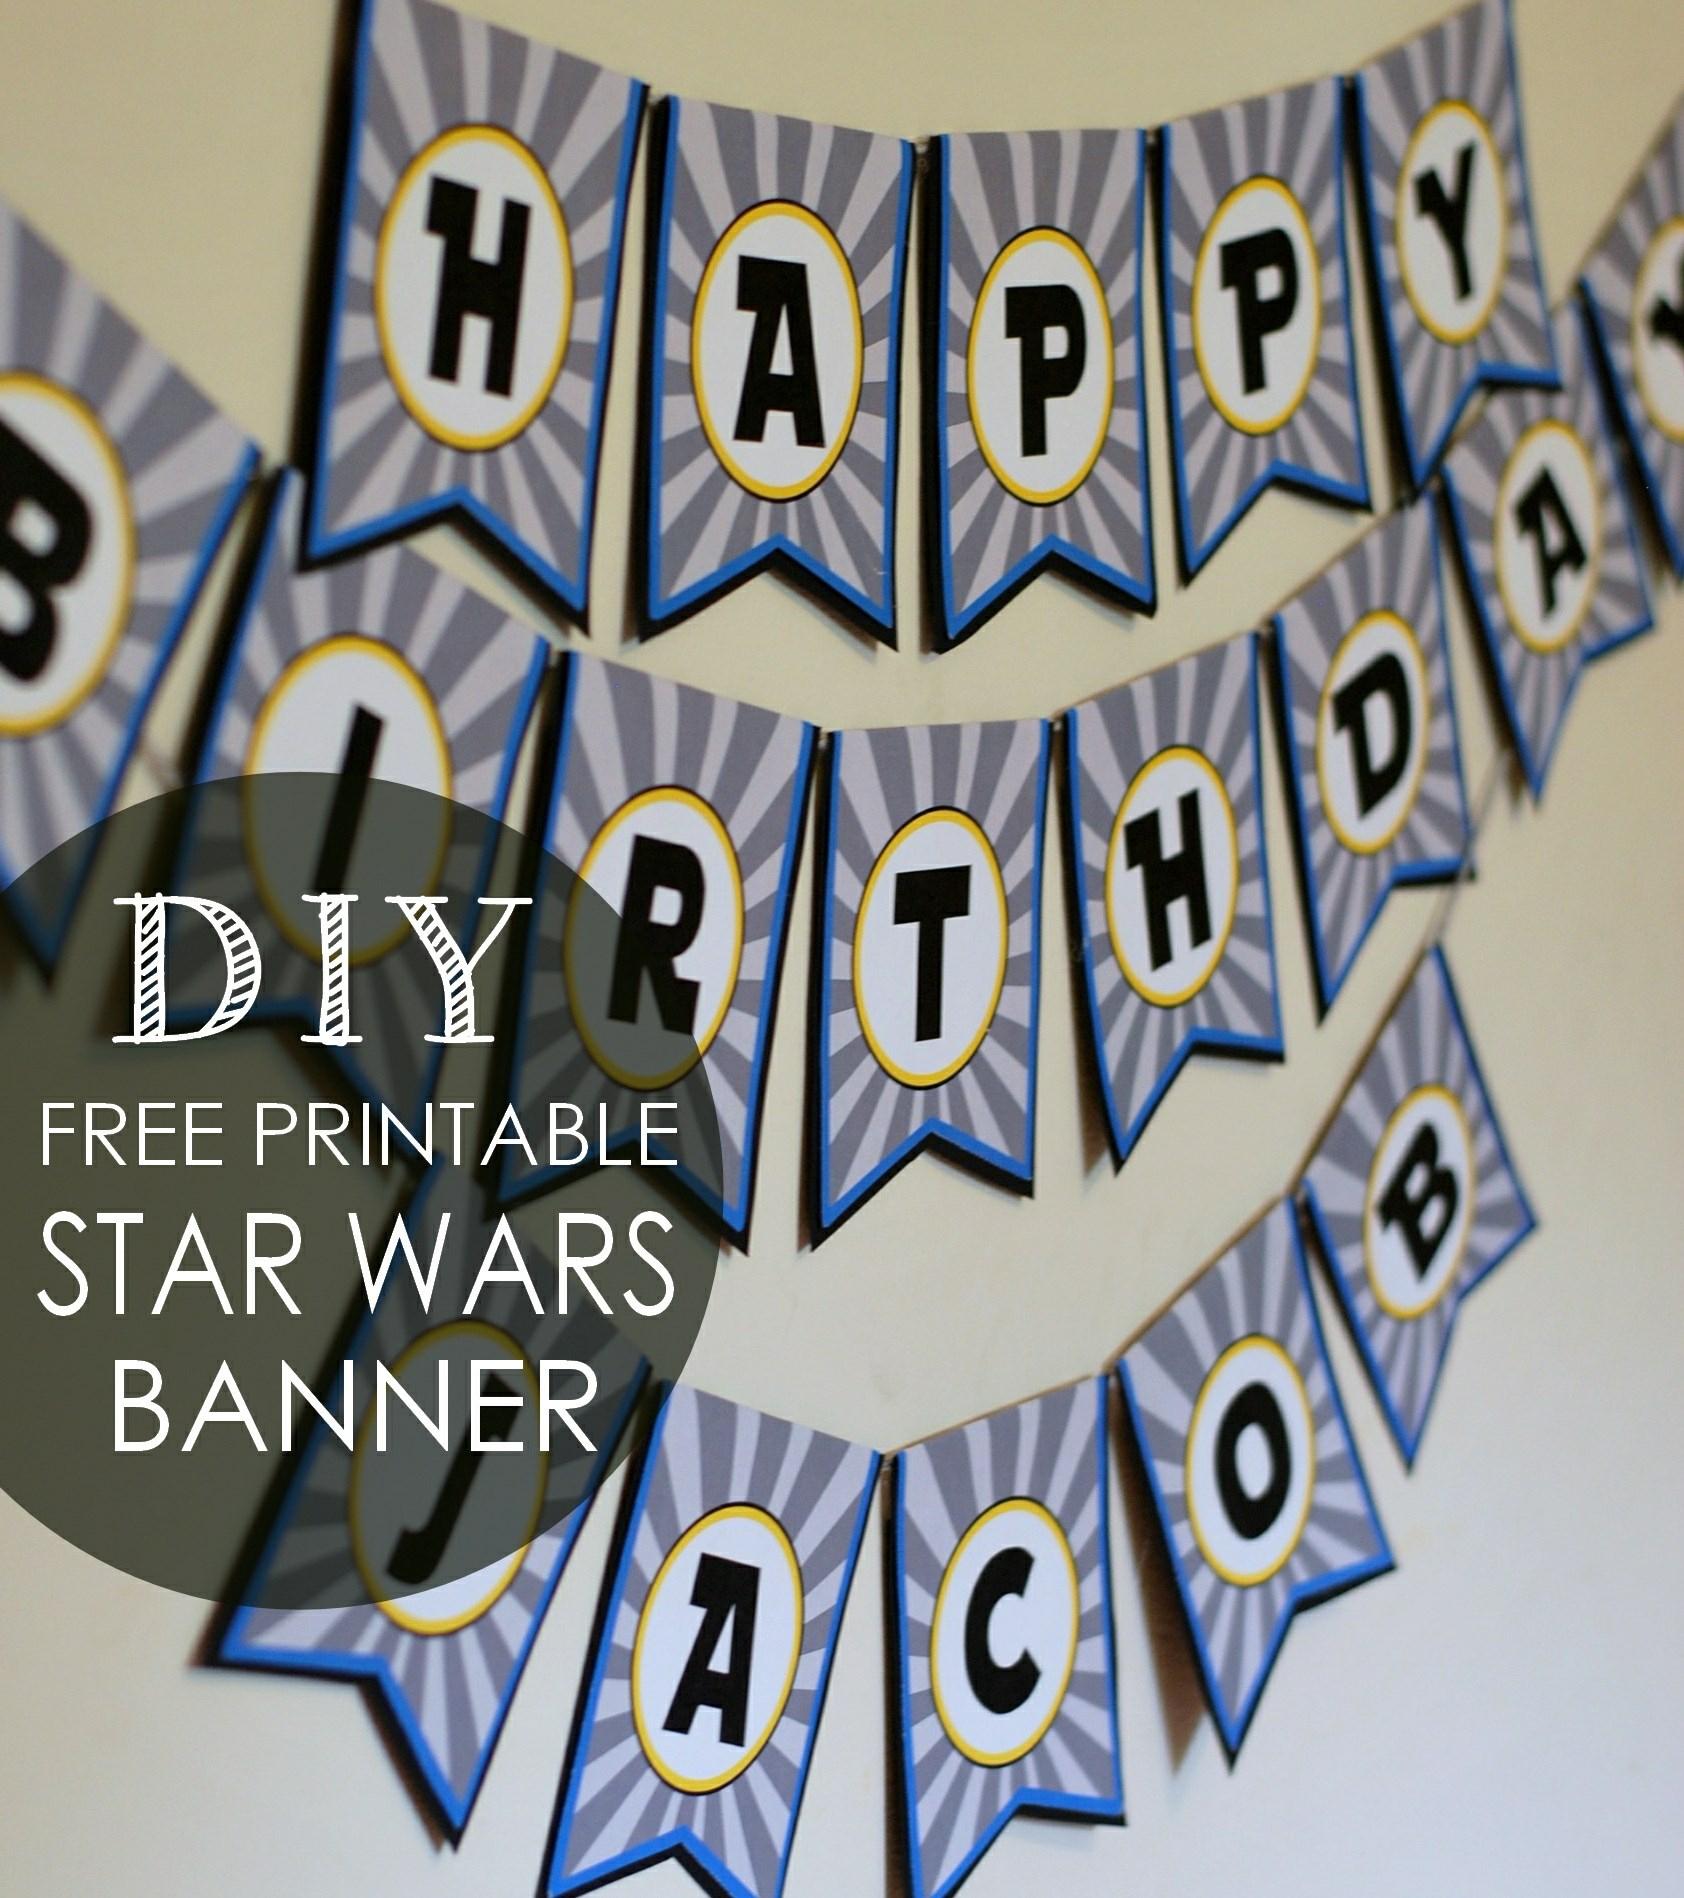 Diy Star Wars Birthday Banner + Free Printables | Posh Tart - Diy Birthday Banner Free Printable